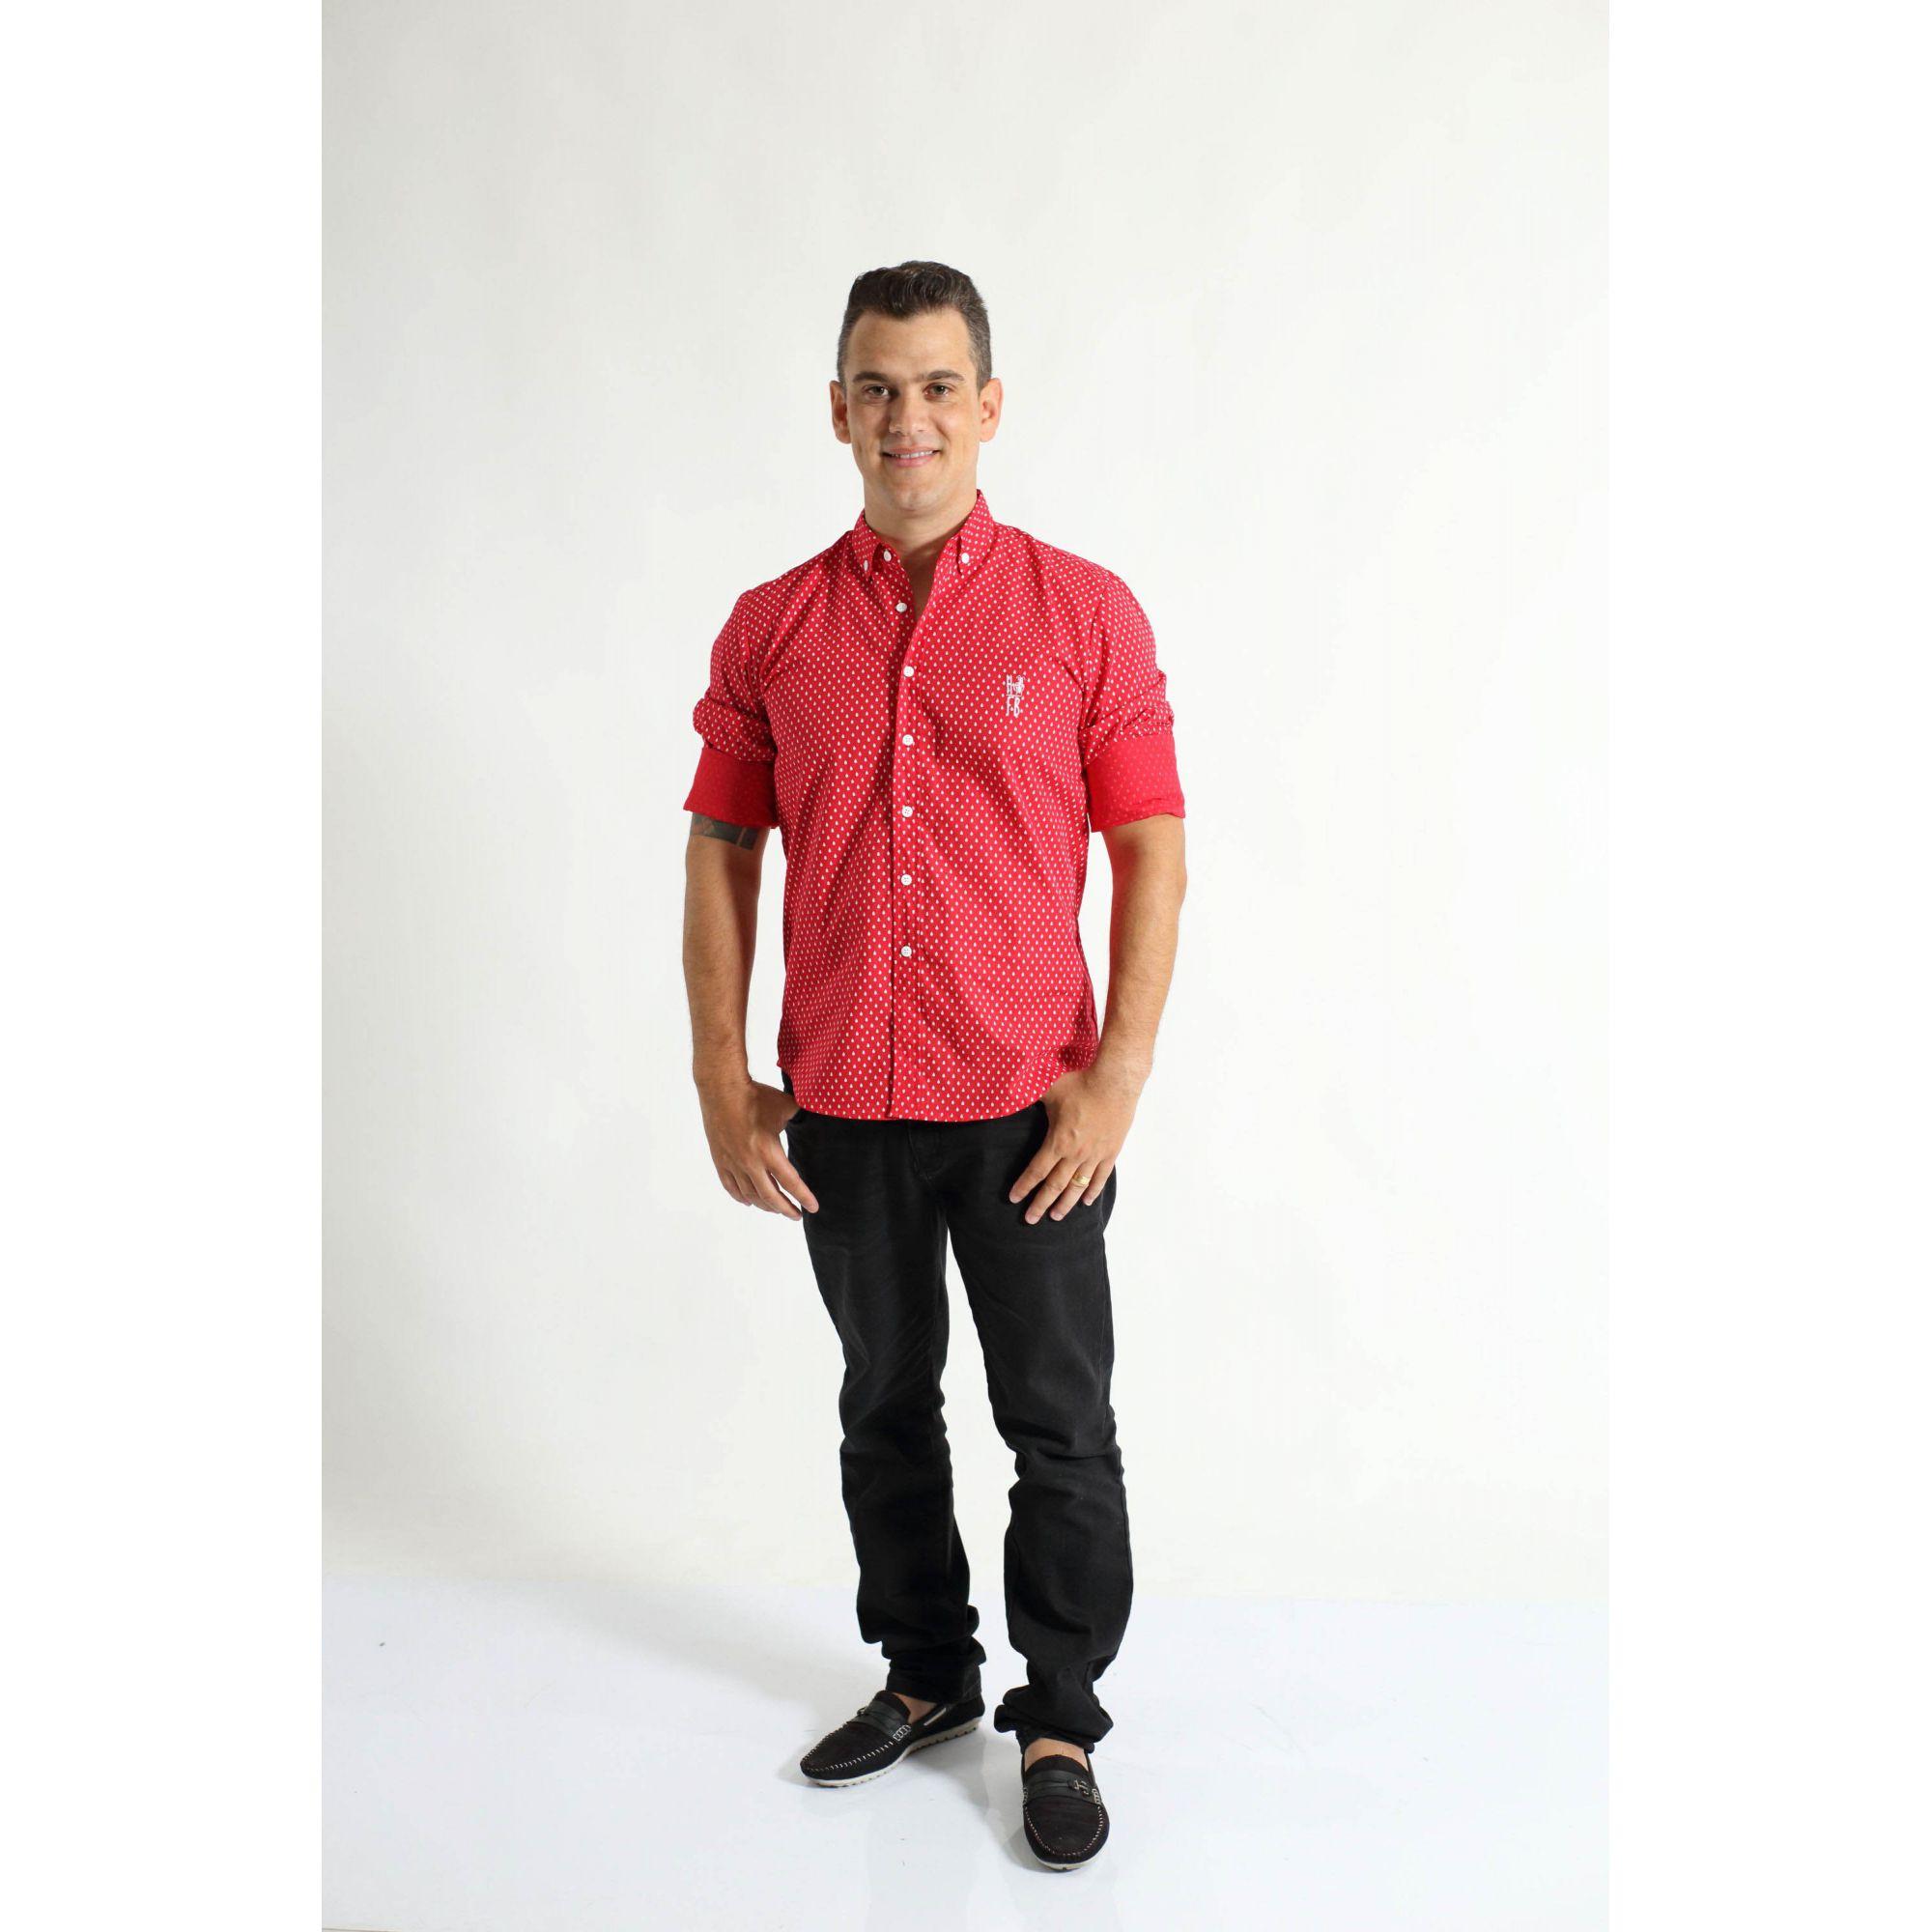 Camisa Social Merry Christimas Vermelha Adulta  - Heitor Fashion Brazil